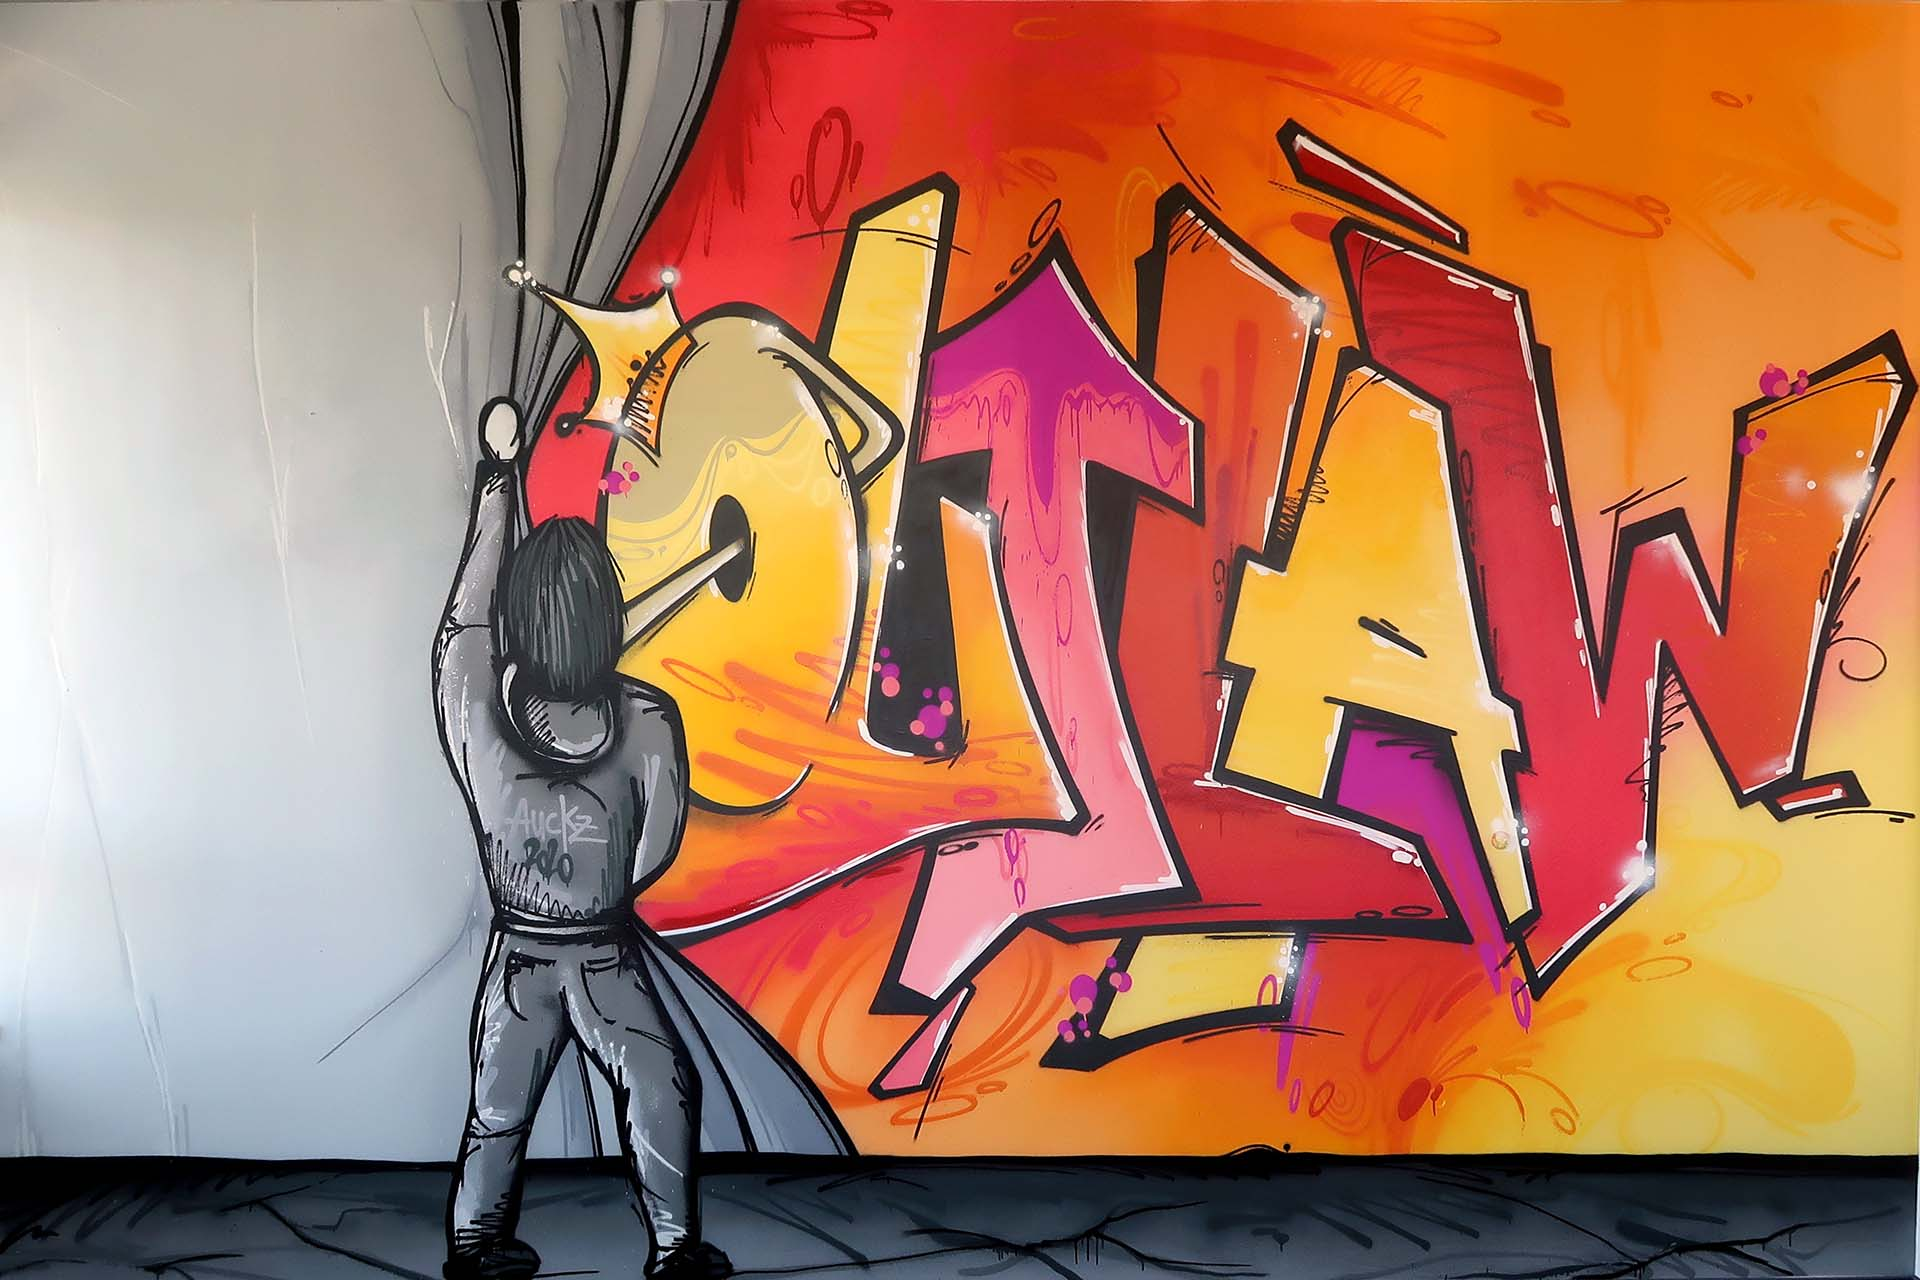 Graffiti, Münster, Studio, Auckz, Outlaw